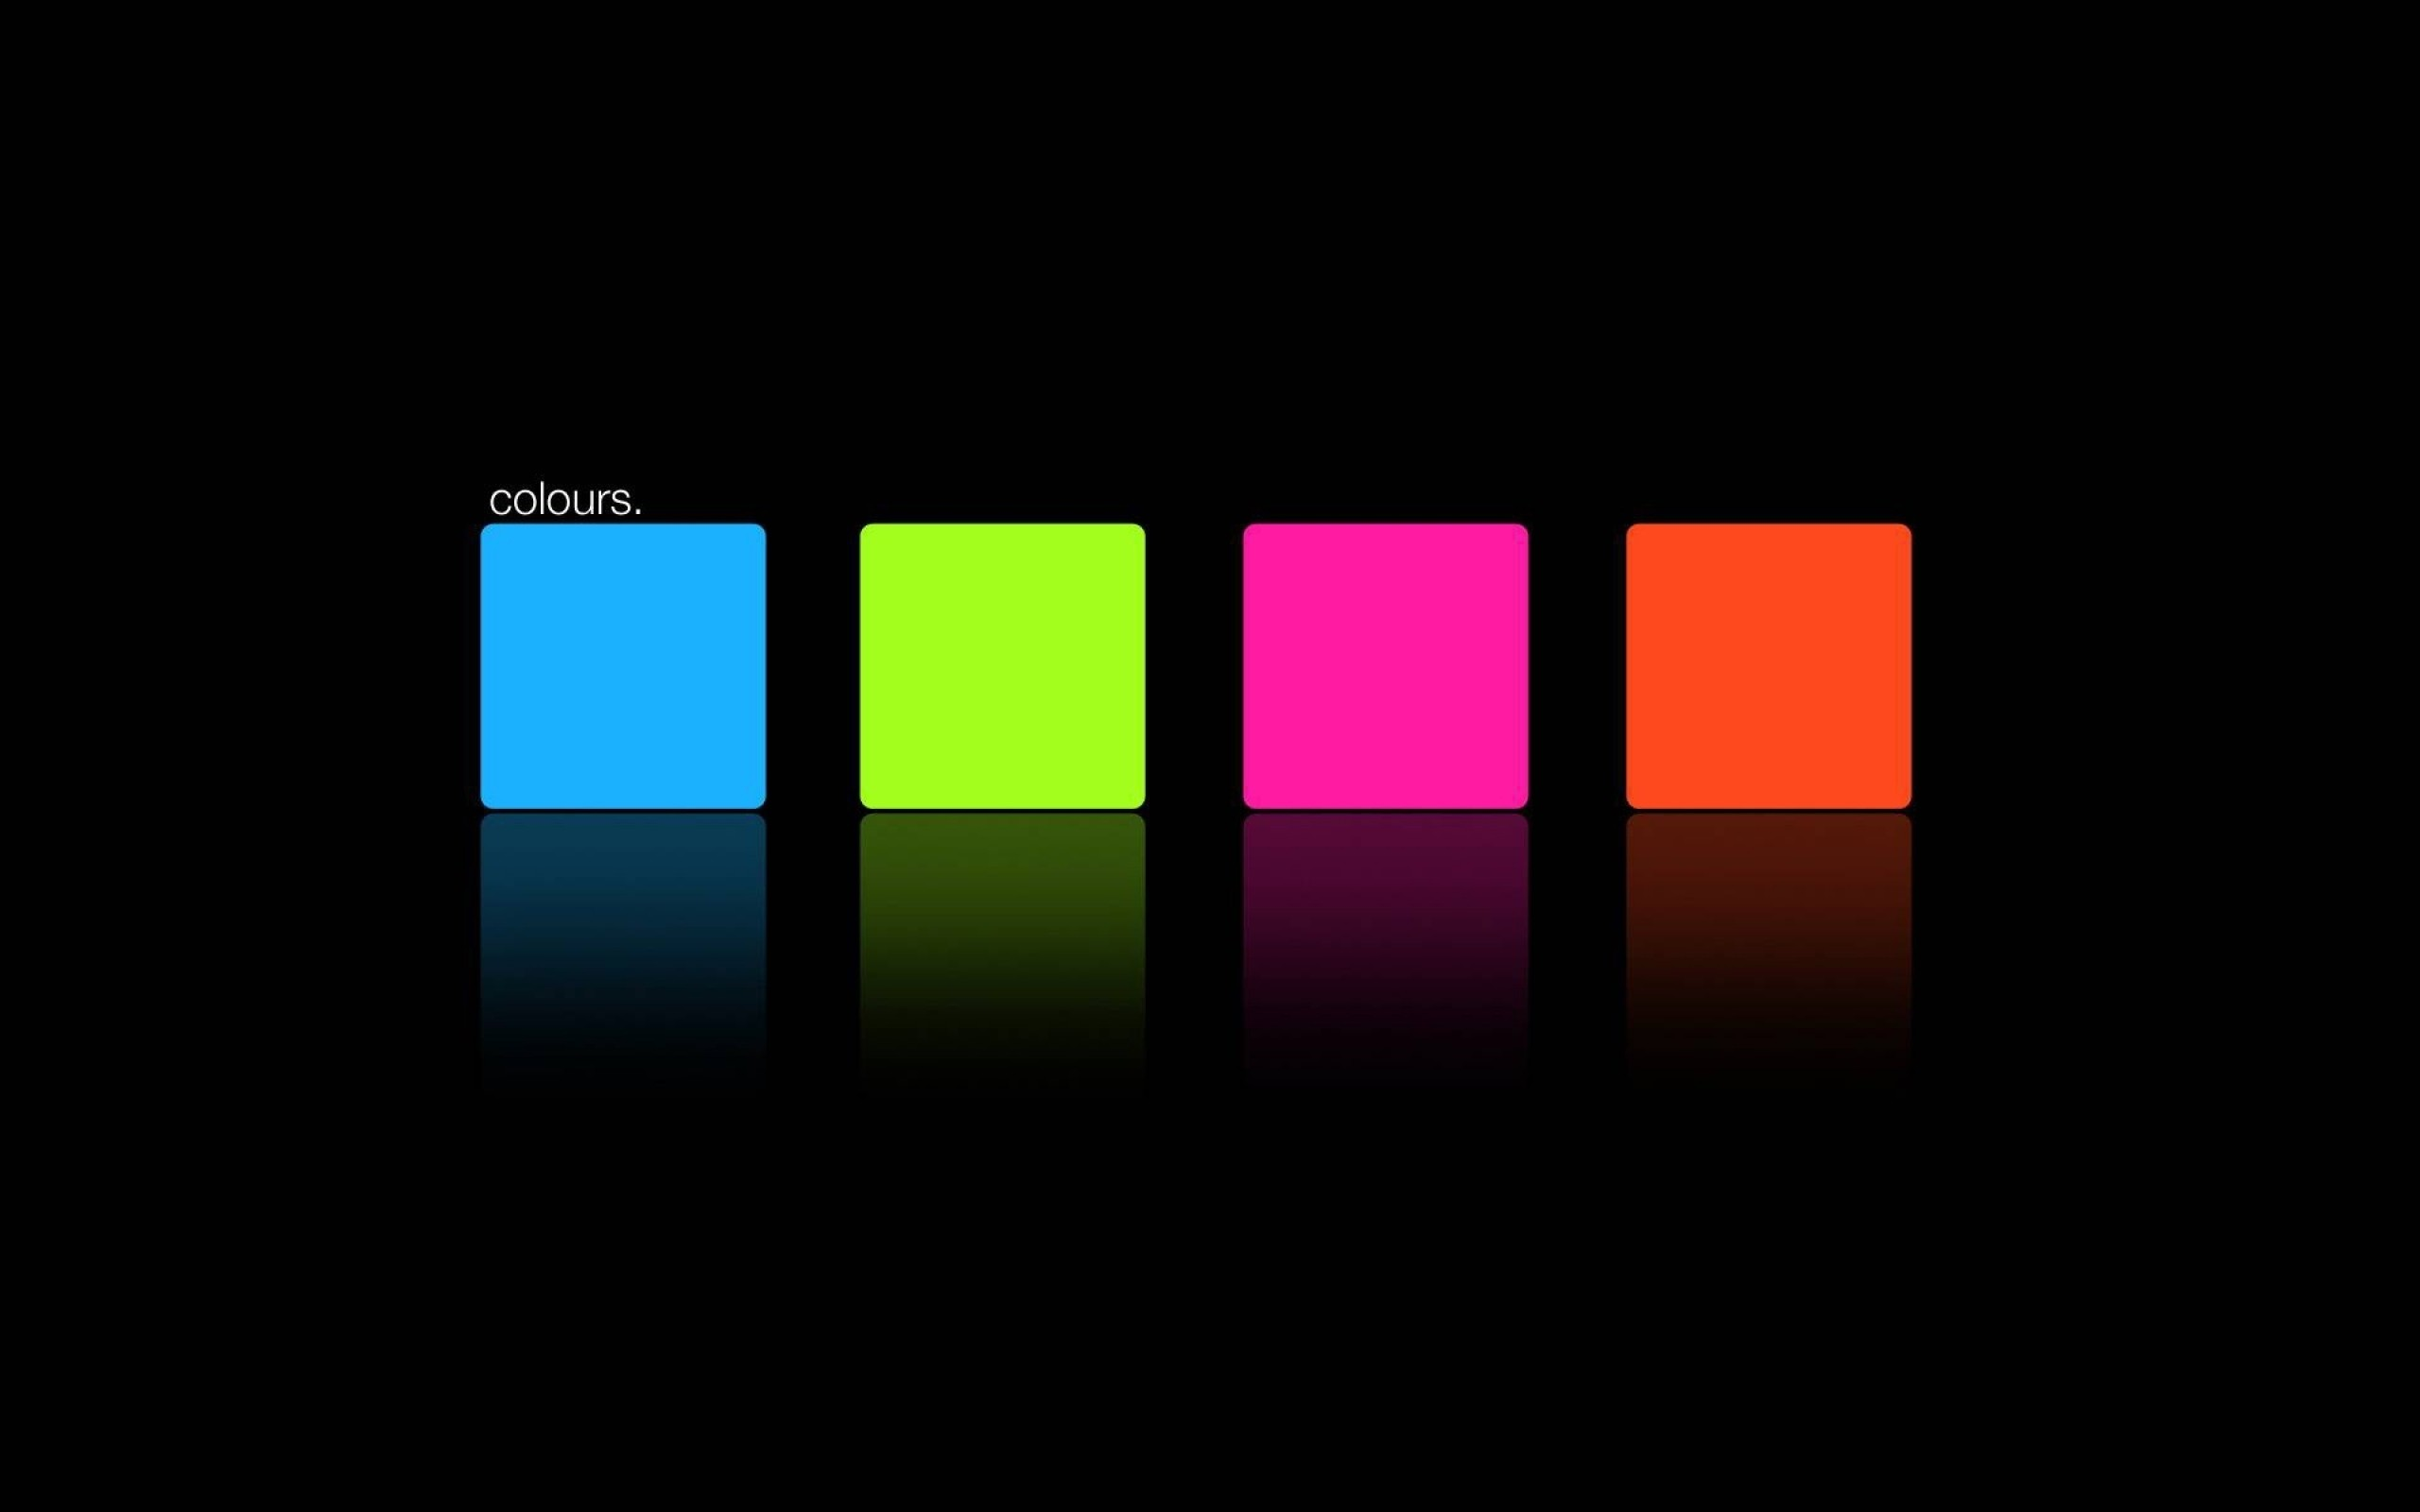 Wallpaper blue, pink, orange, green, square